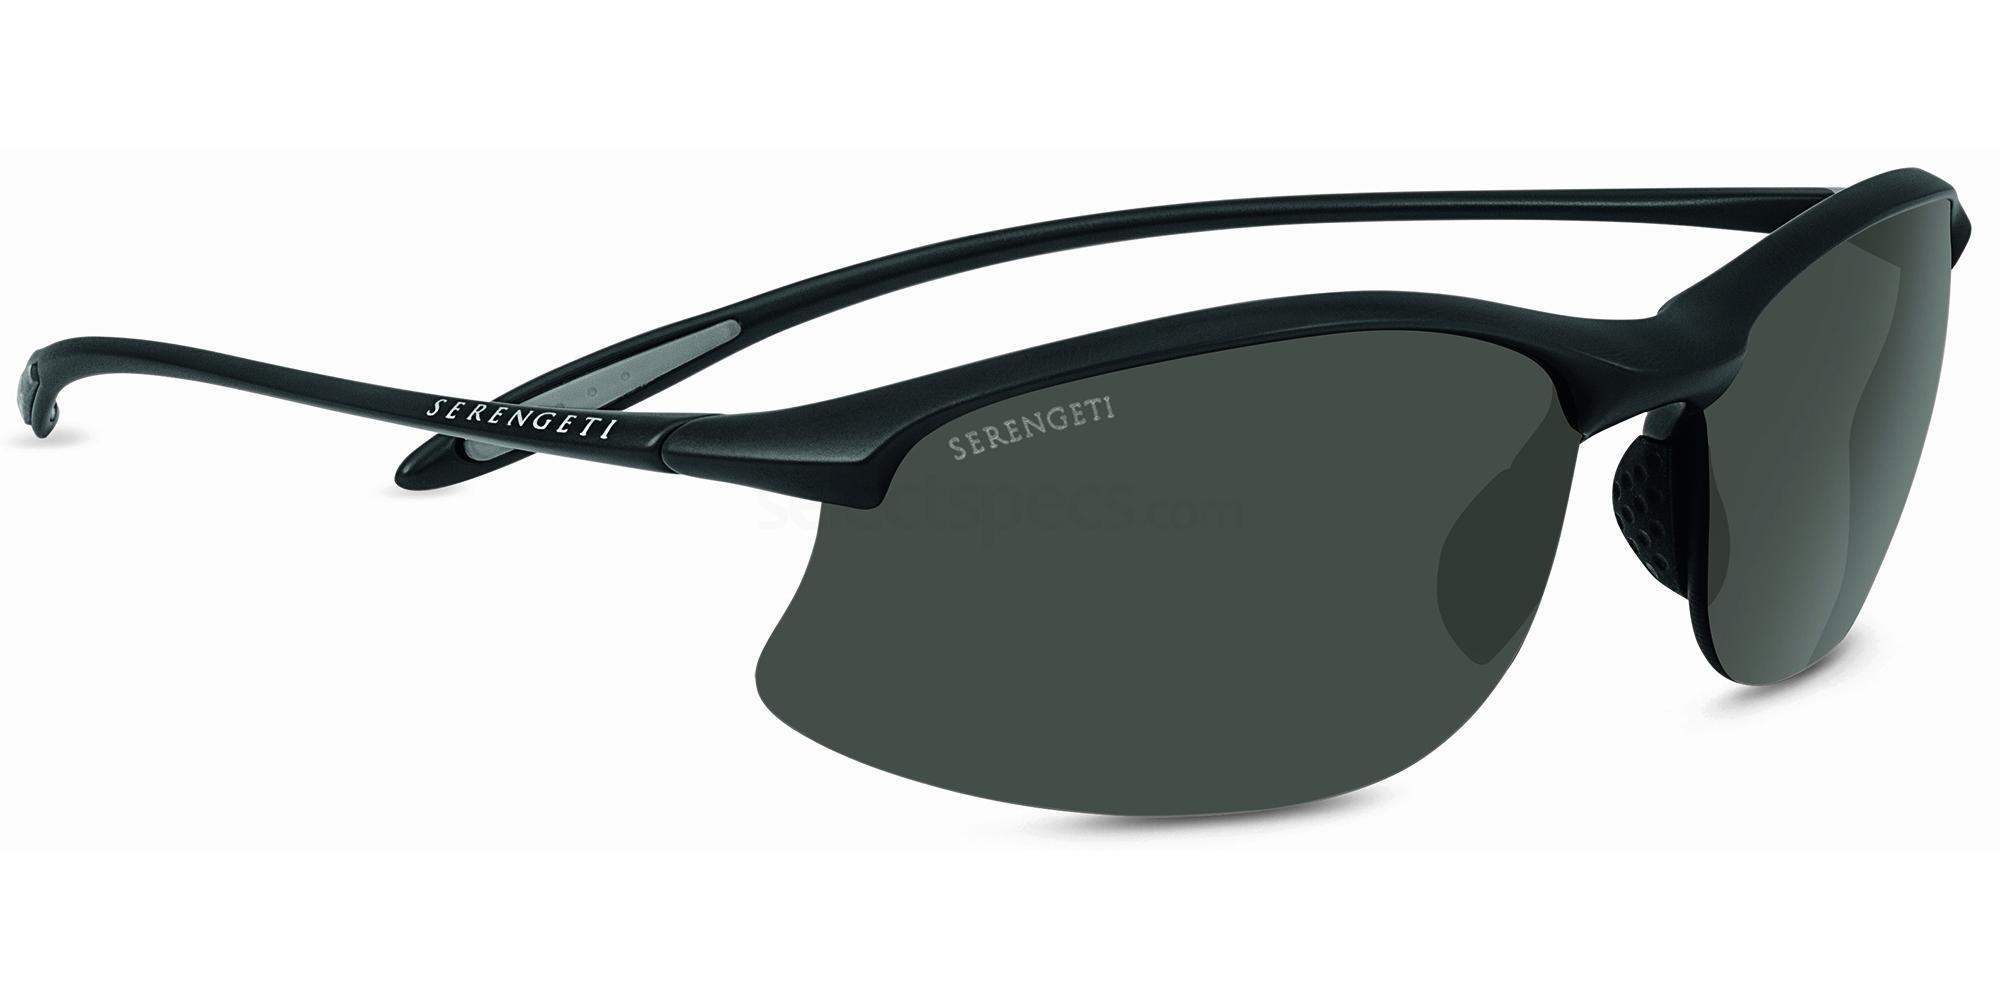 7355 Polarmax MAESTRALE Sunglasses, Serengeti